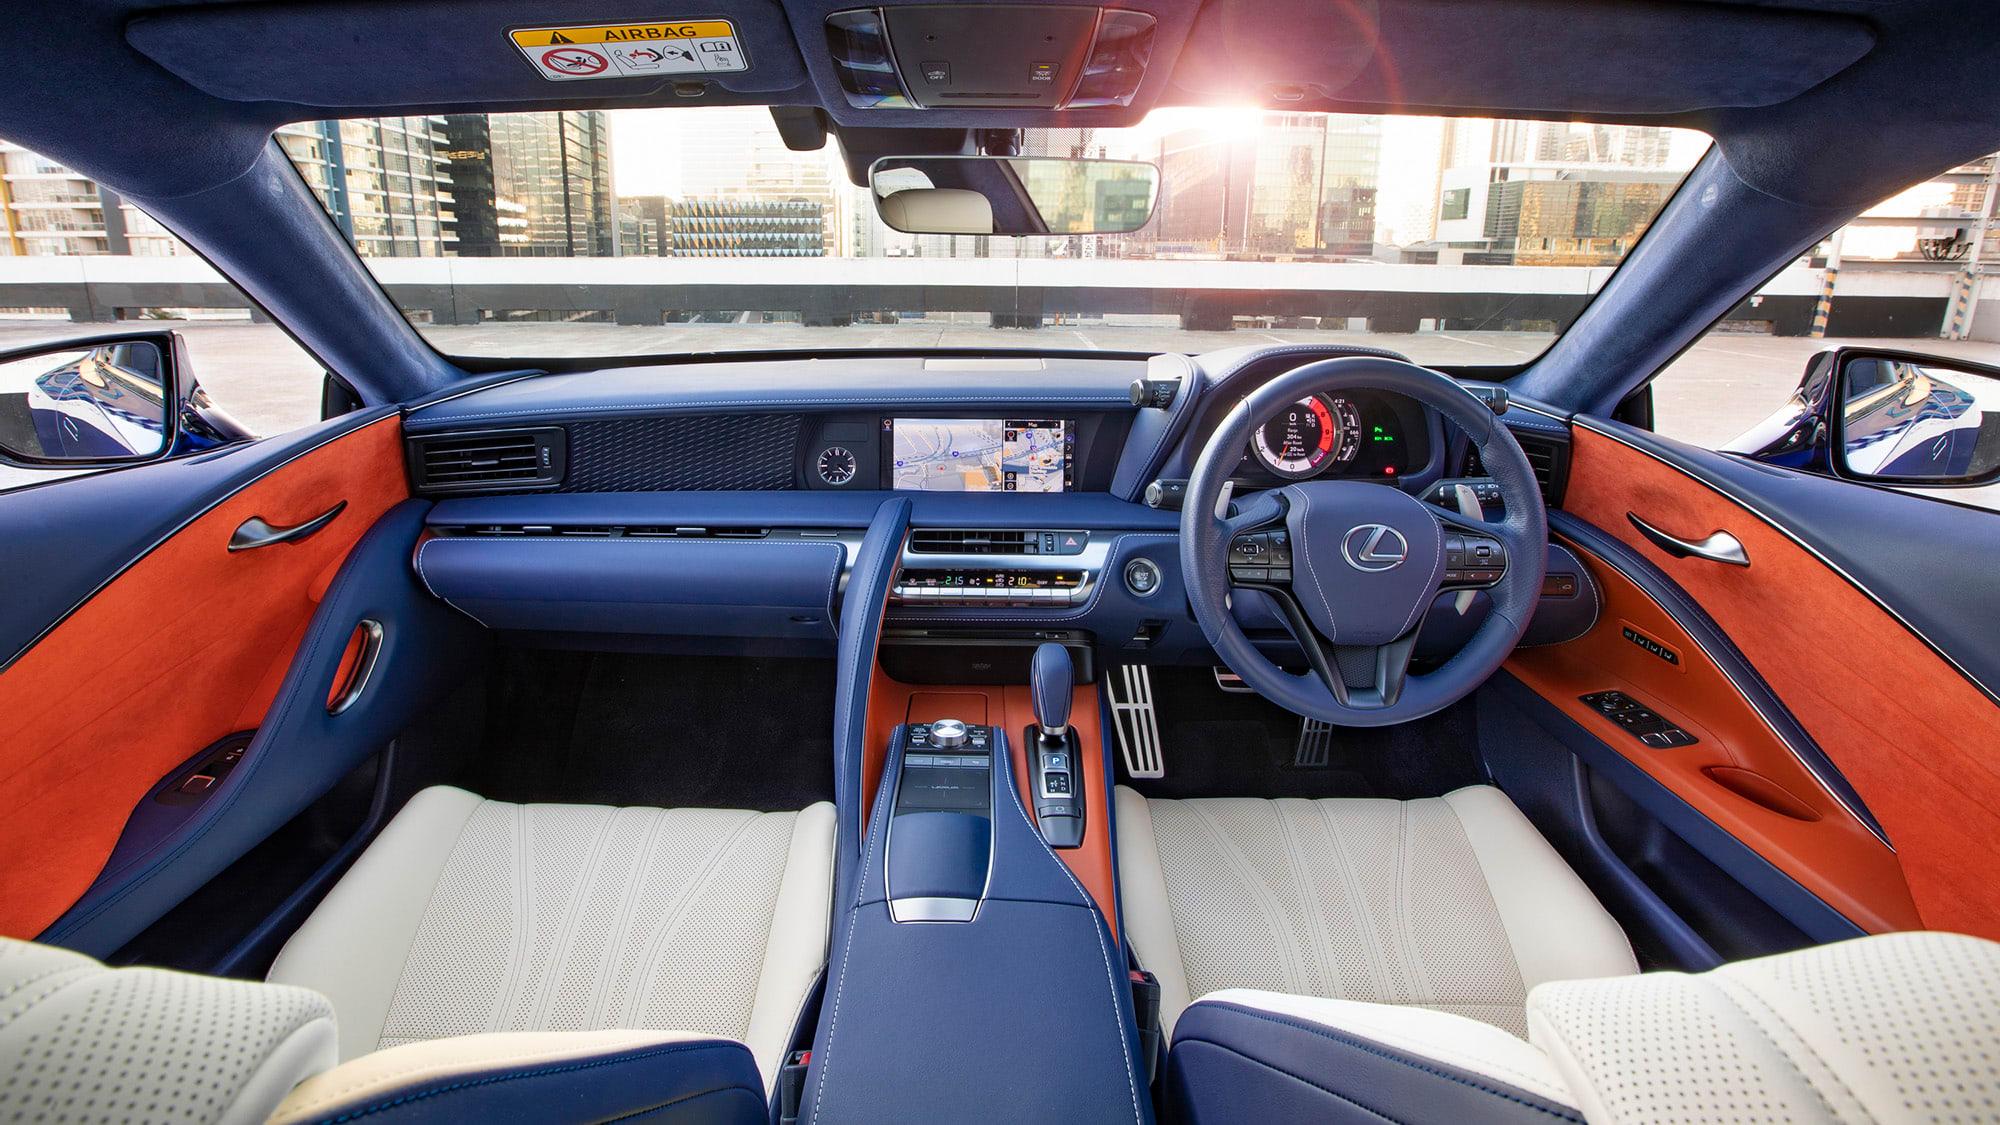 2018 Lexus LC Morphic Blue Limited Edition 41164 hr